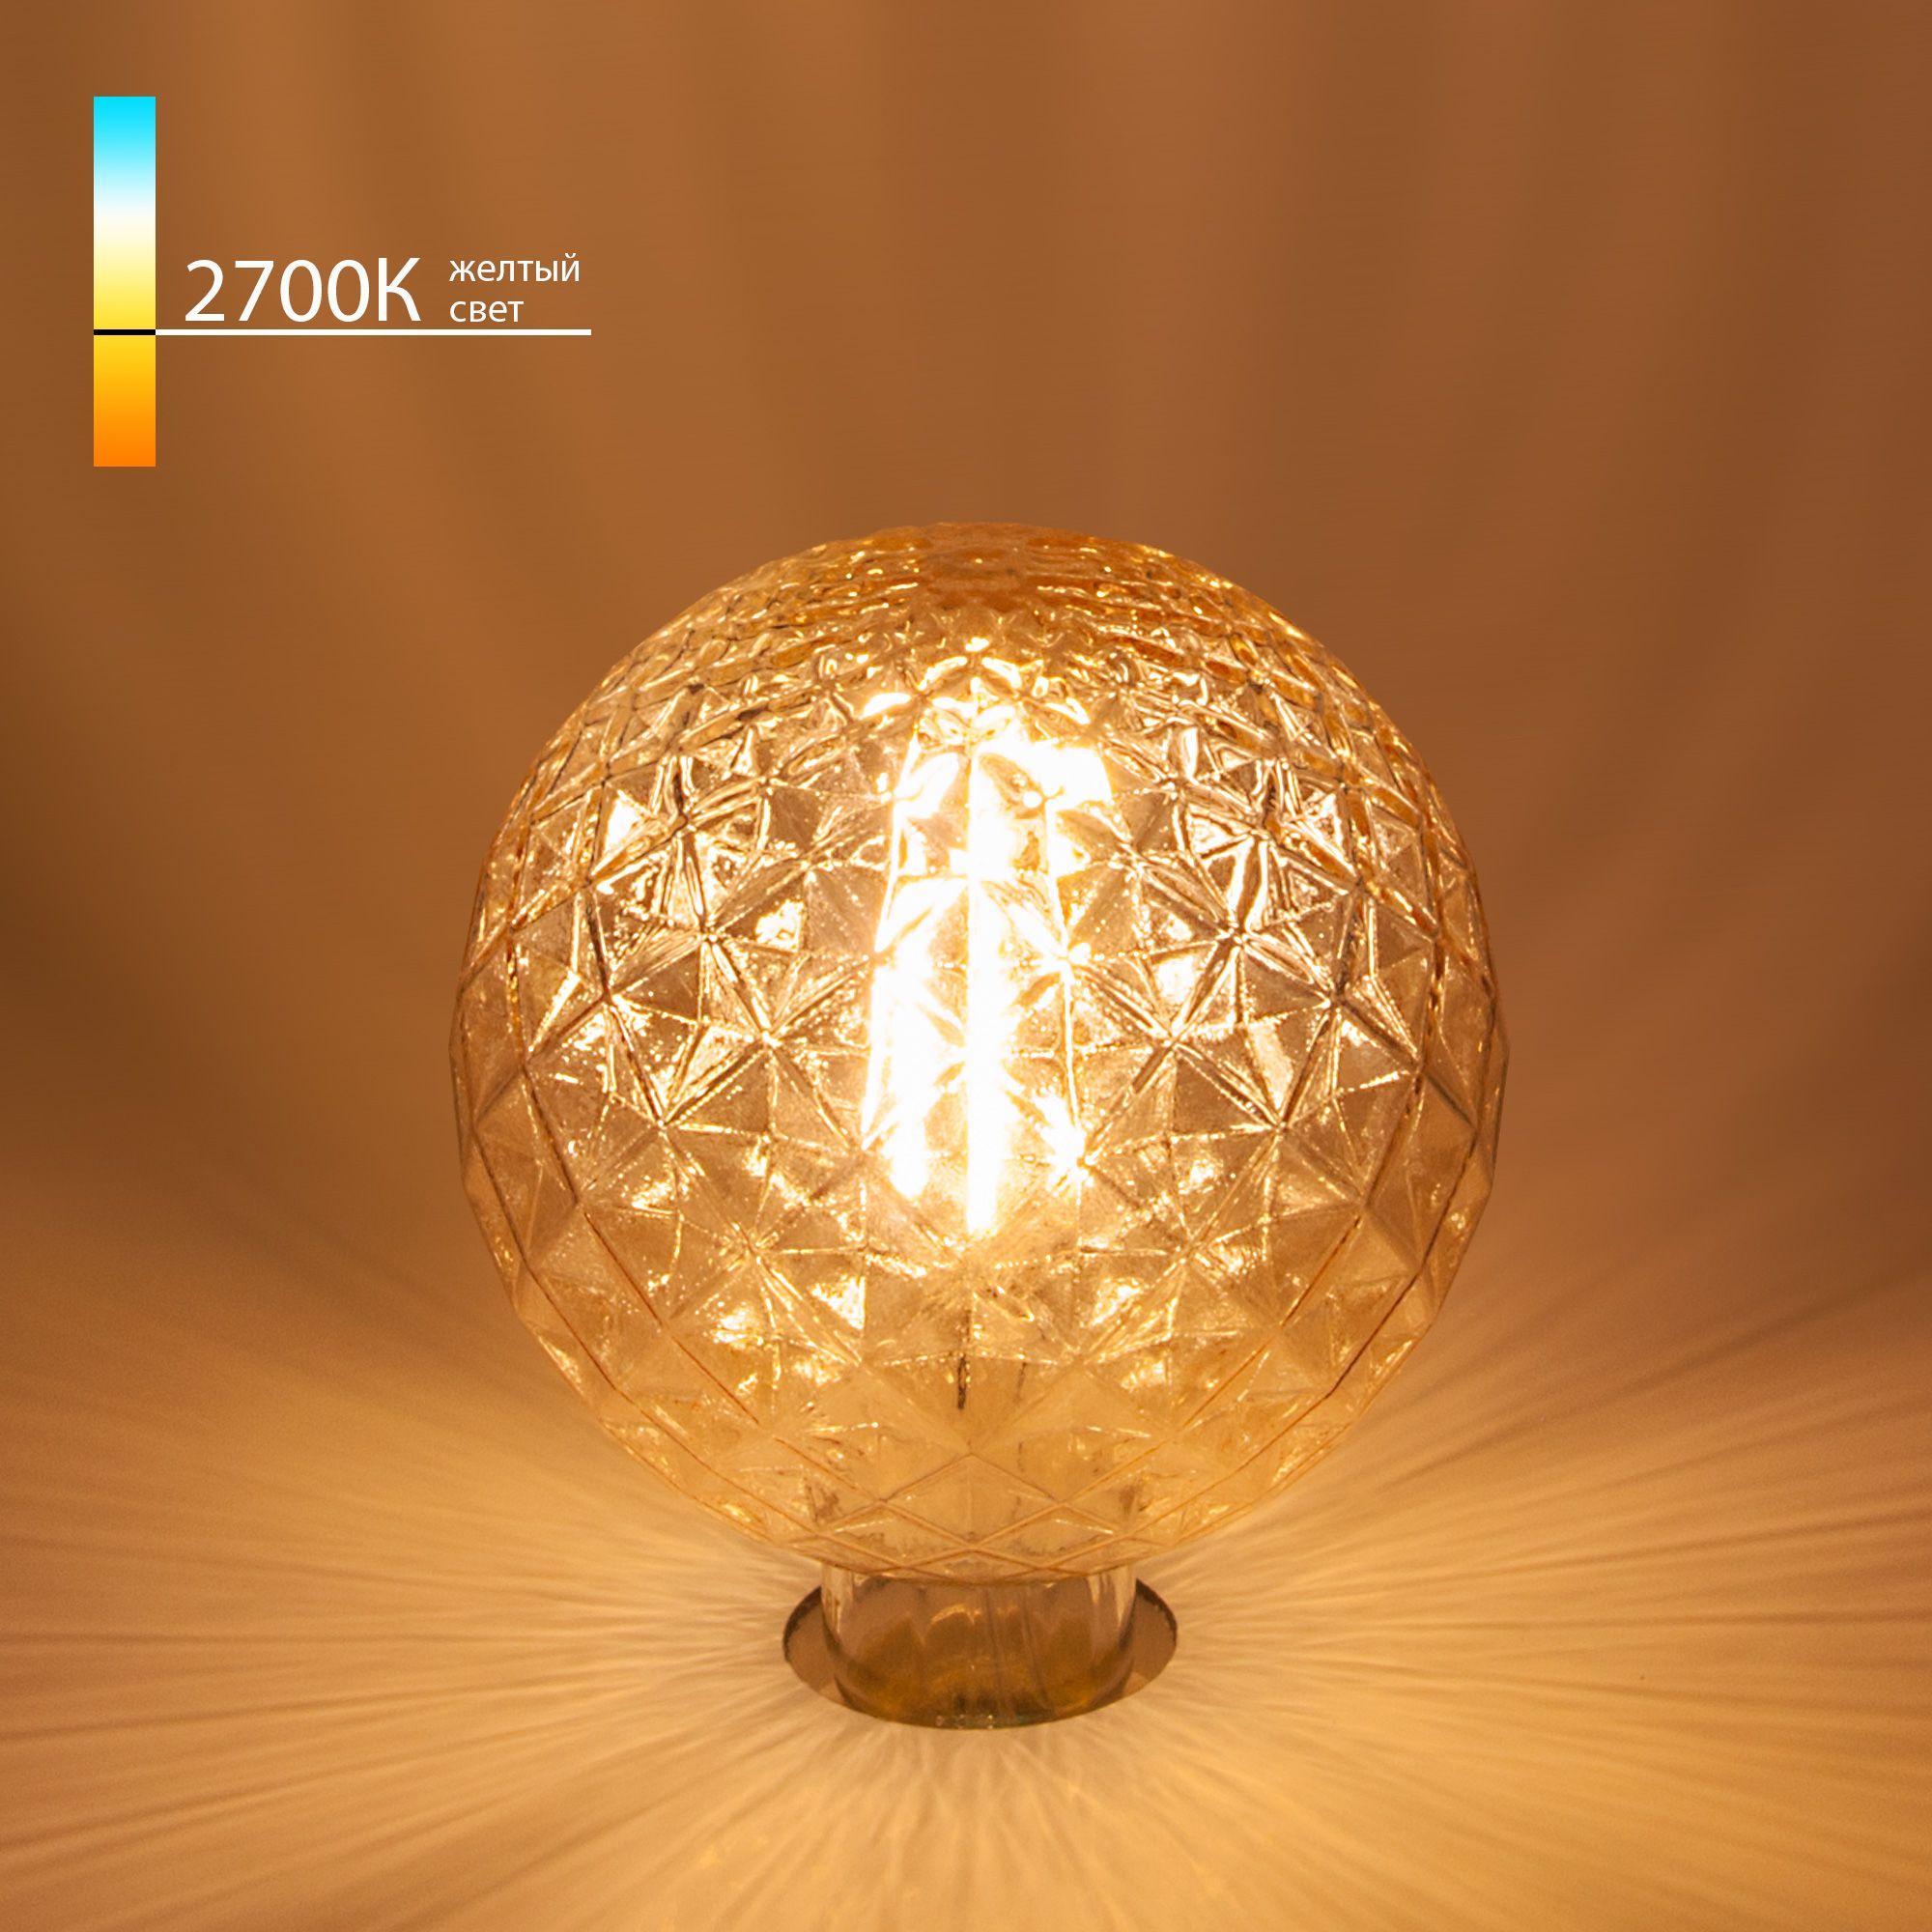 Филаментная светодиодная лампа Globe 4W 2700K E27 BL154